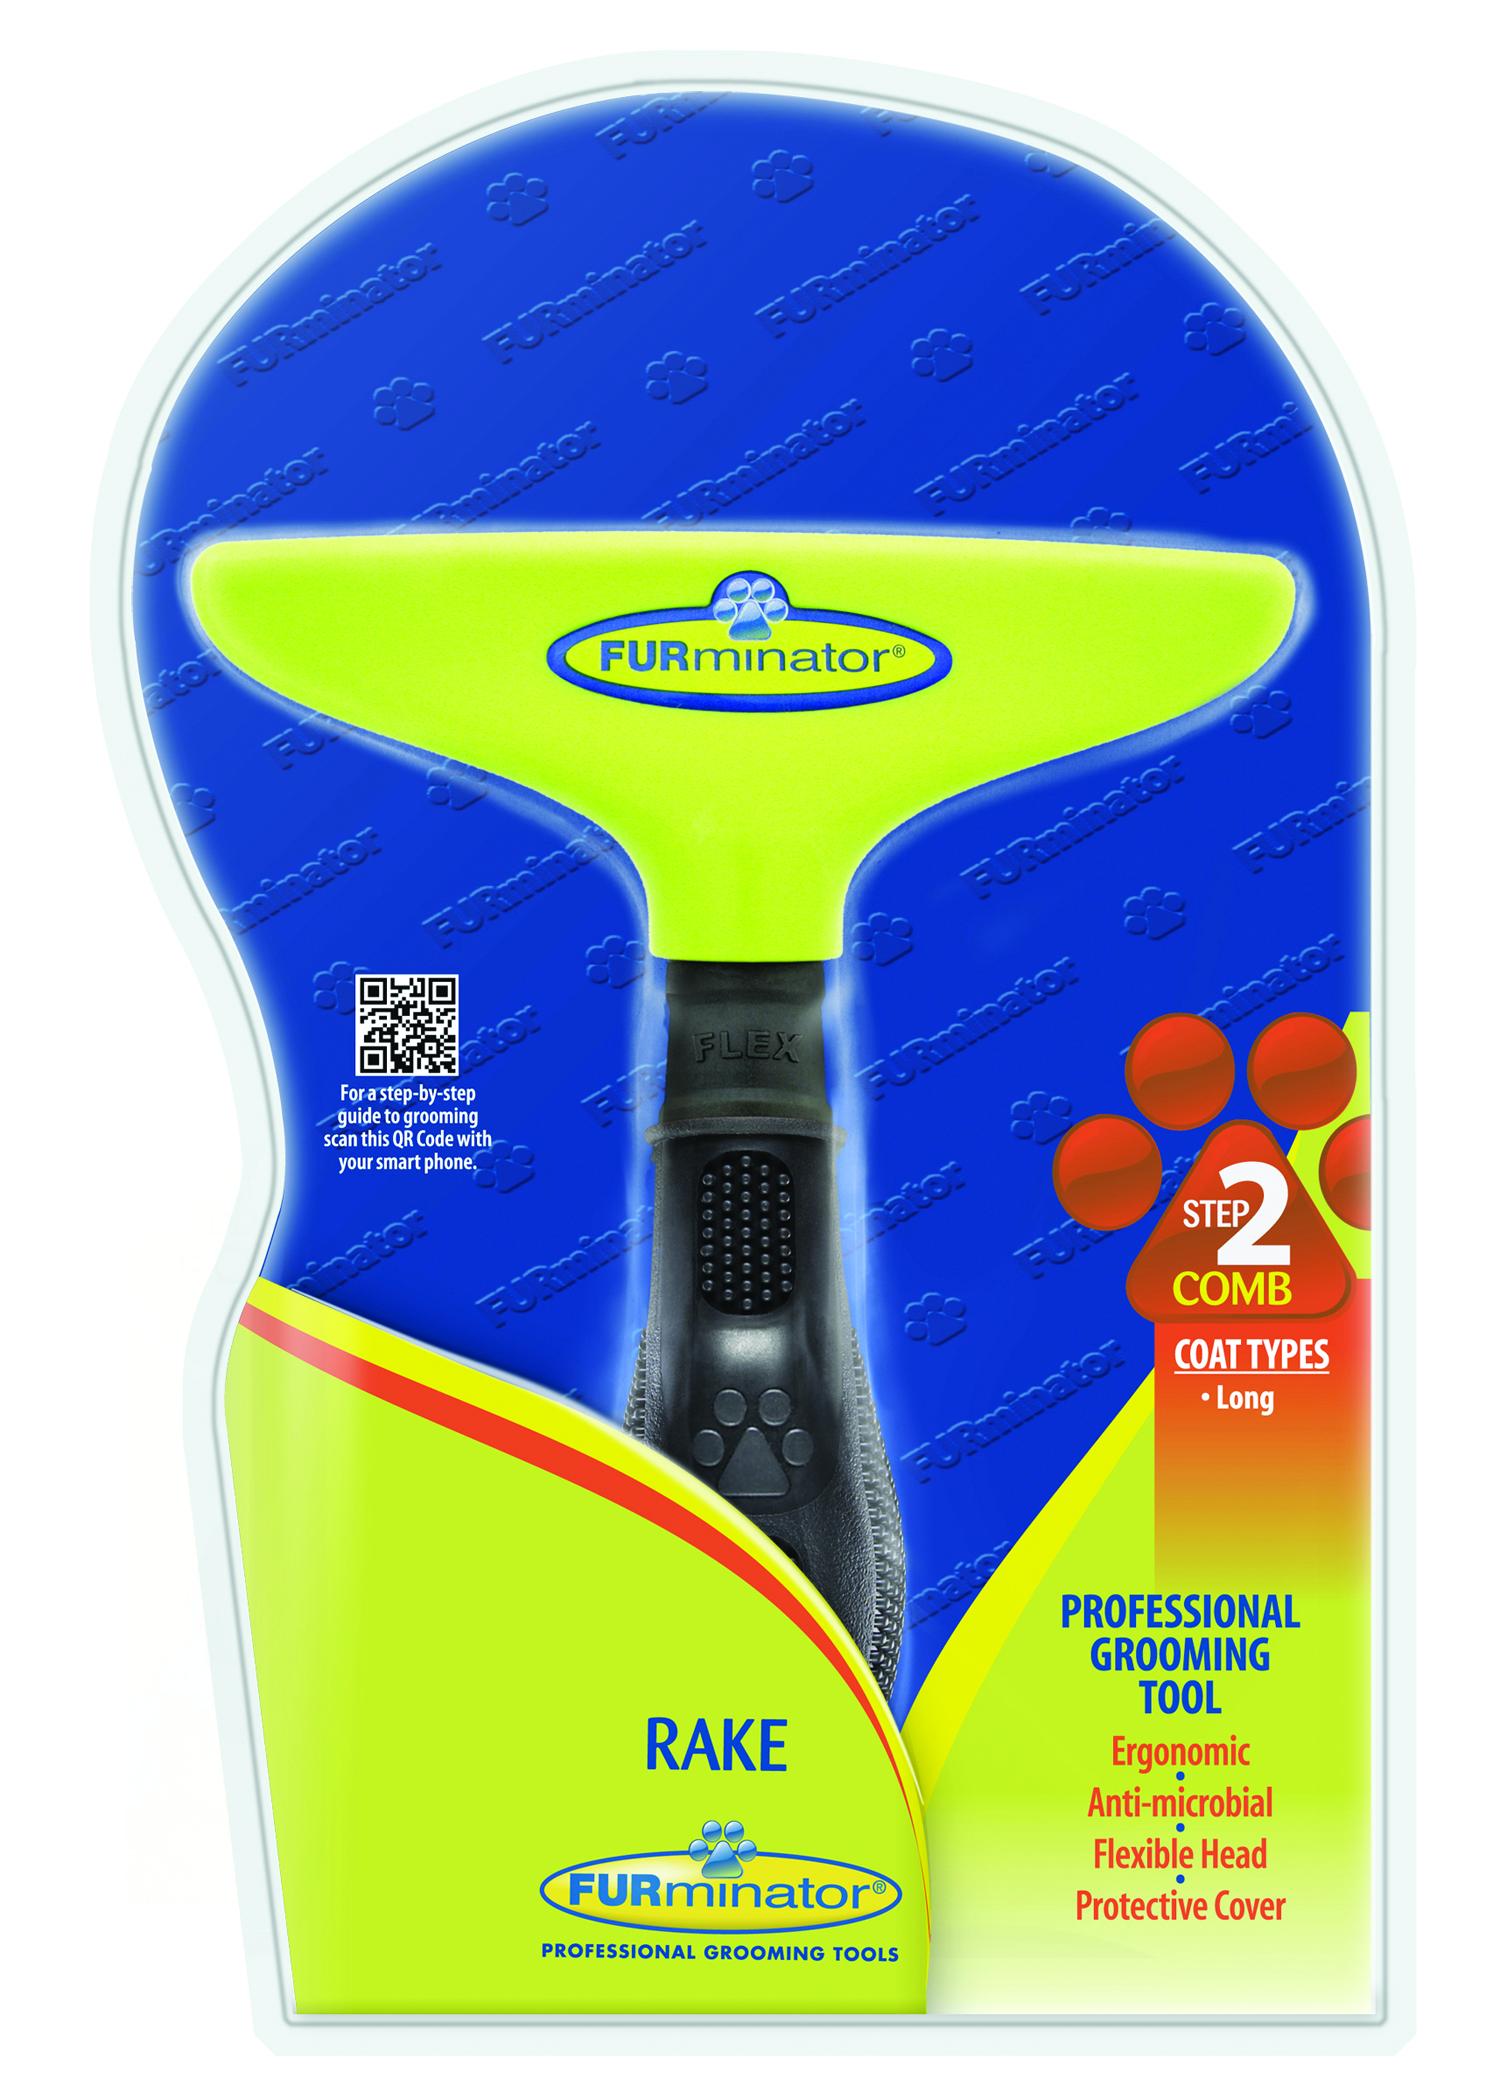 Furminator Furminator Grooming Rake For Dogs